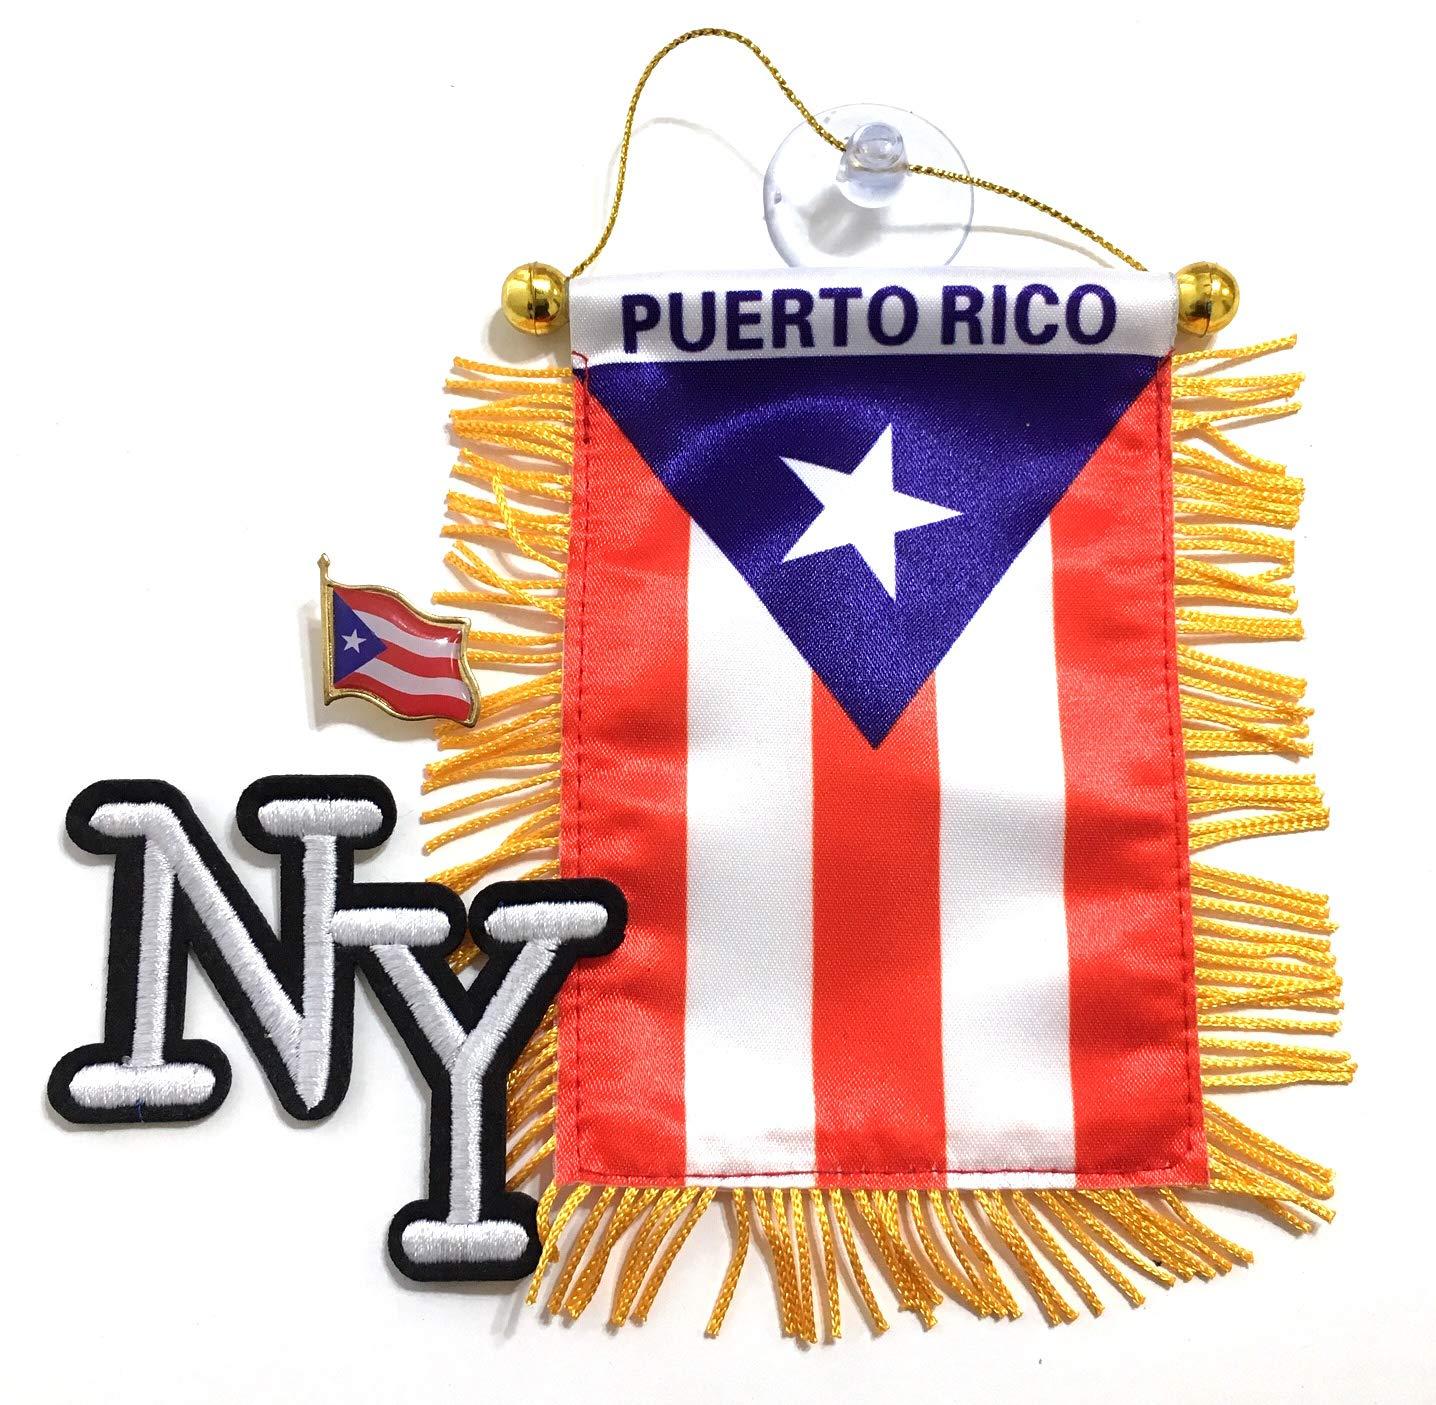 Amazon.com: Puerto Rico La bandera de puertorriqueño pequeño puertorriqueño para su automóvil auto uso SUV en espejo retrovisor: Car Electronics